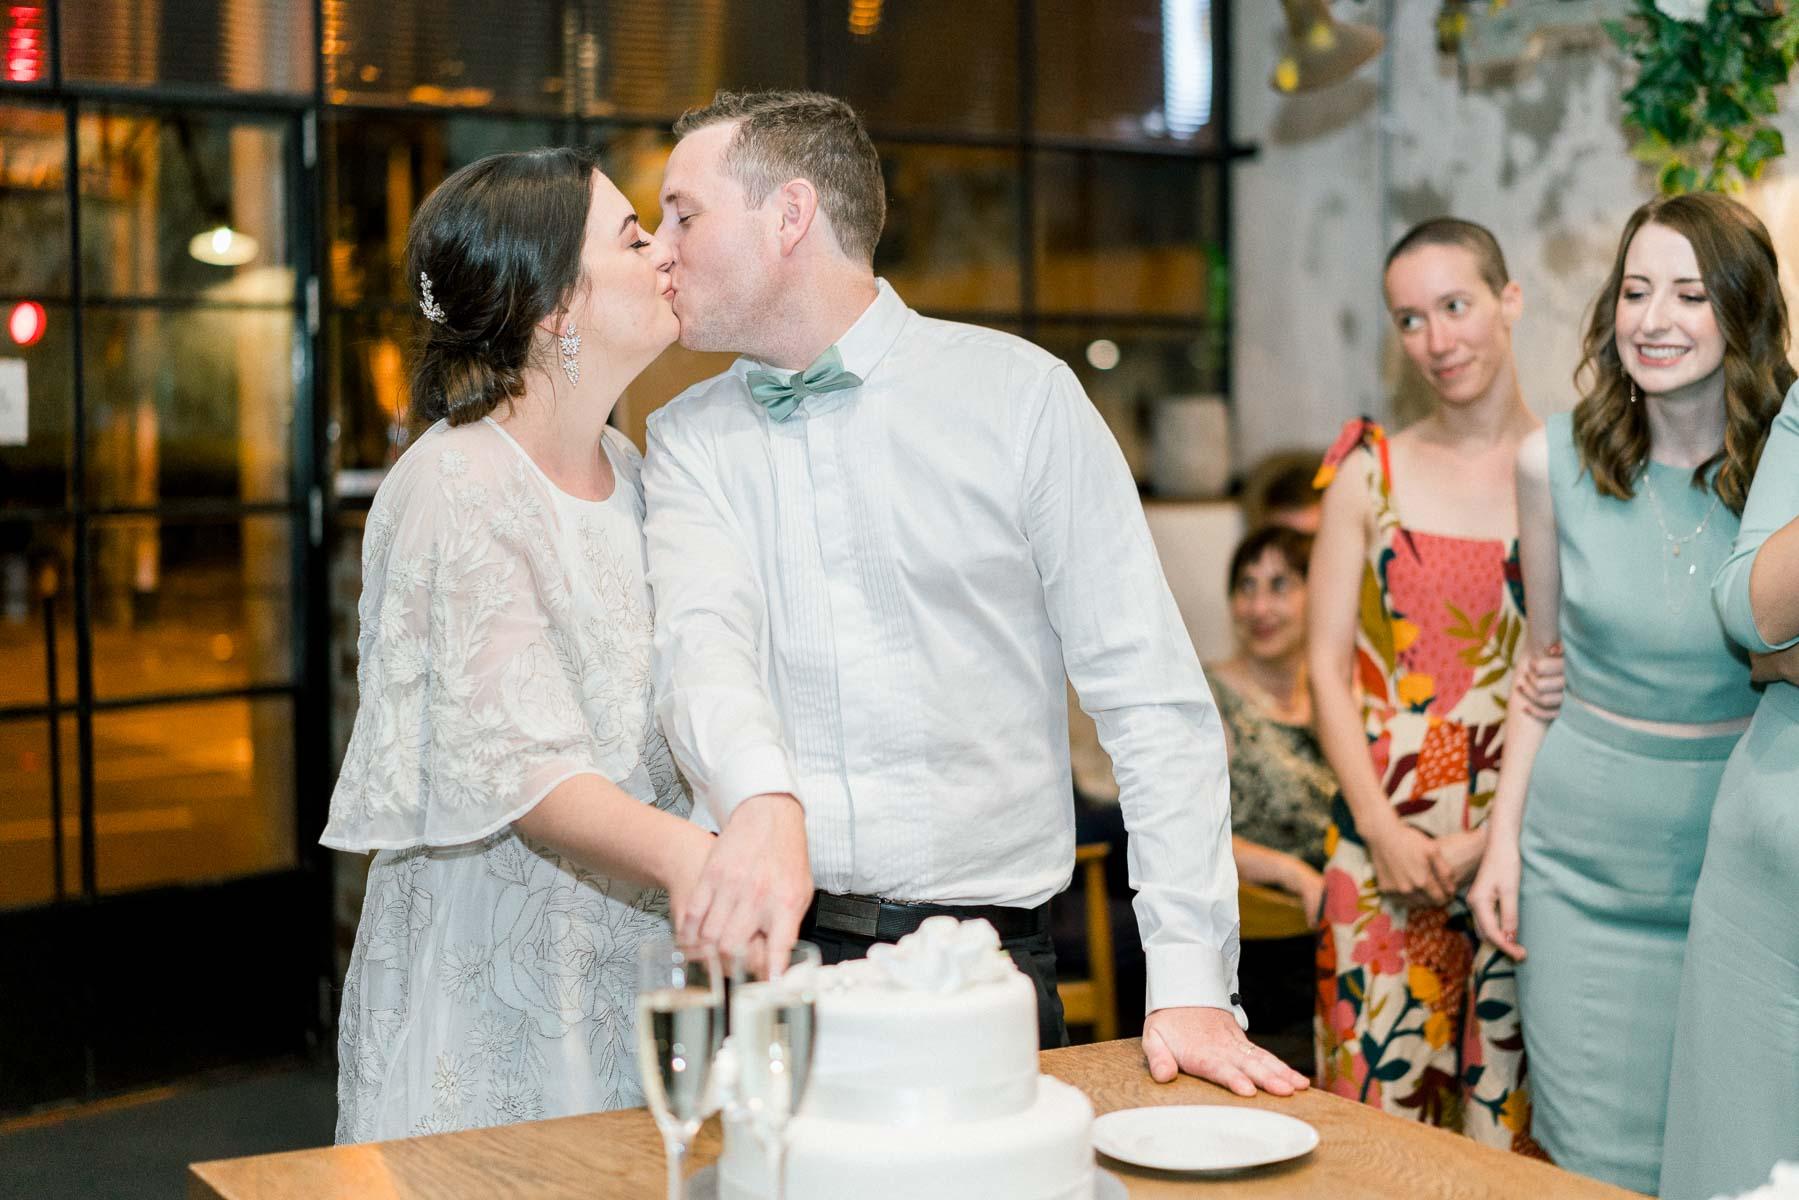 little-henri-cafe-wedding-thornbury-heart+soul-weddings-jane-aaron-06176.jpg